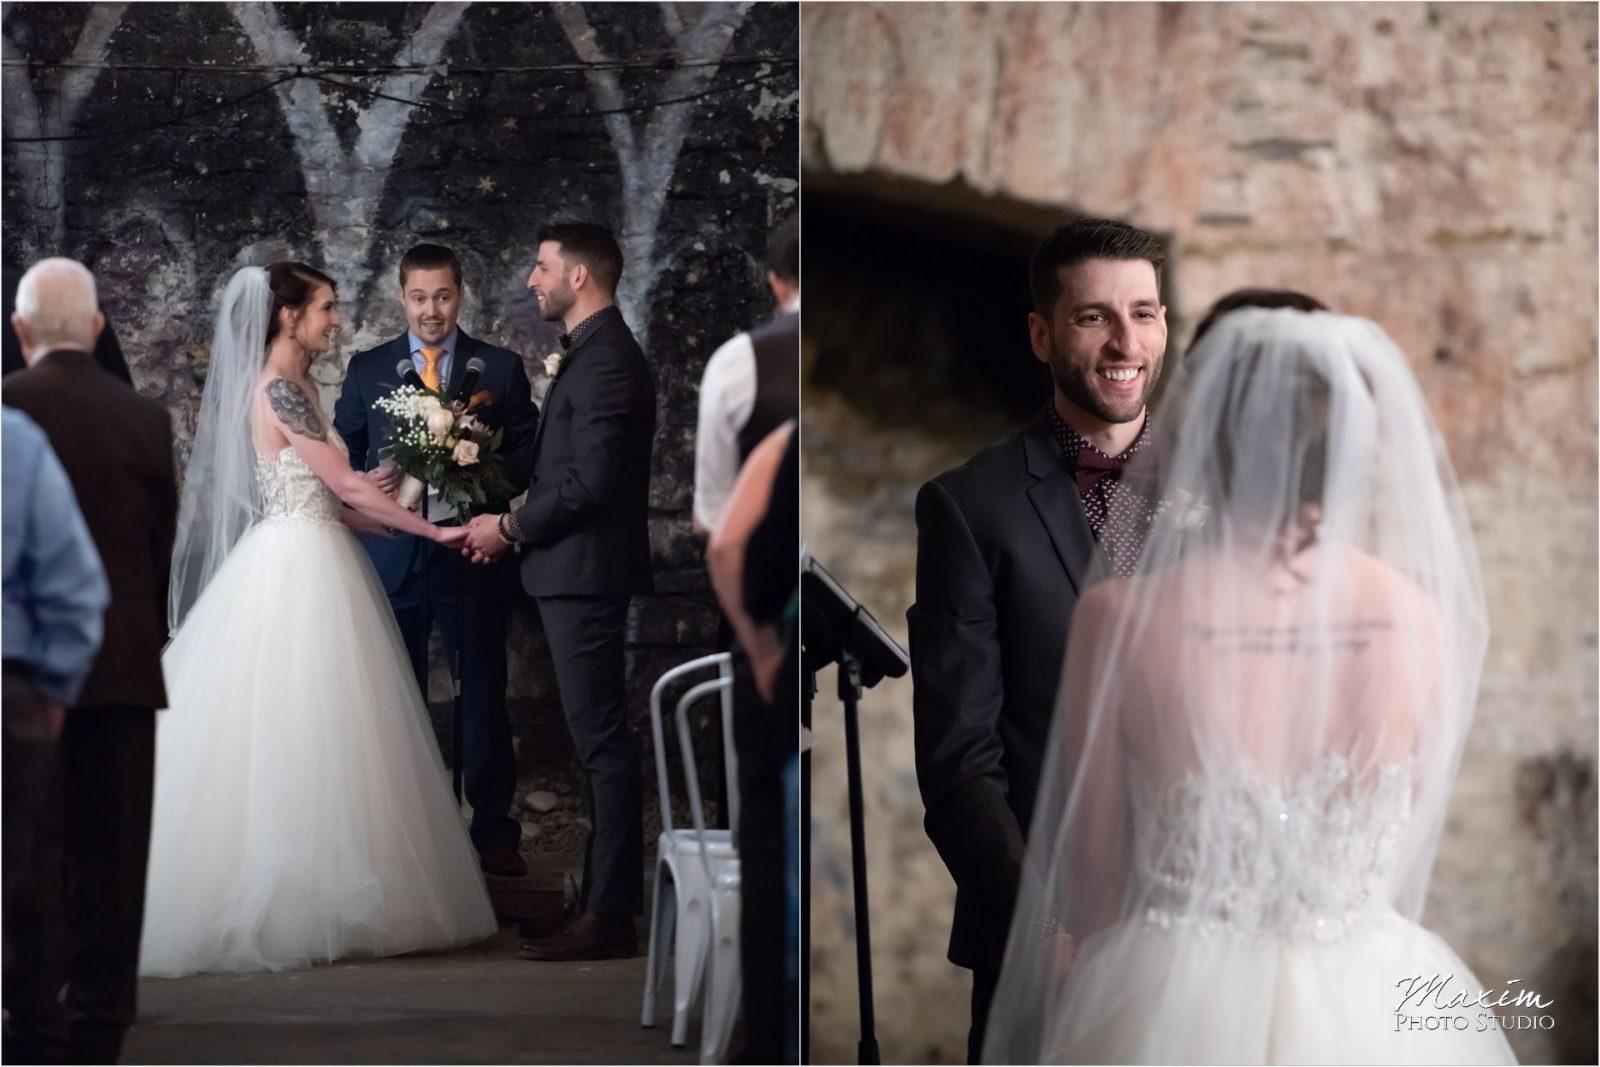 The Mockbee Cincinnati Wedding ceremony